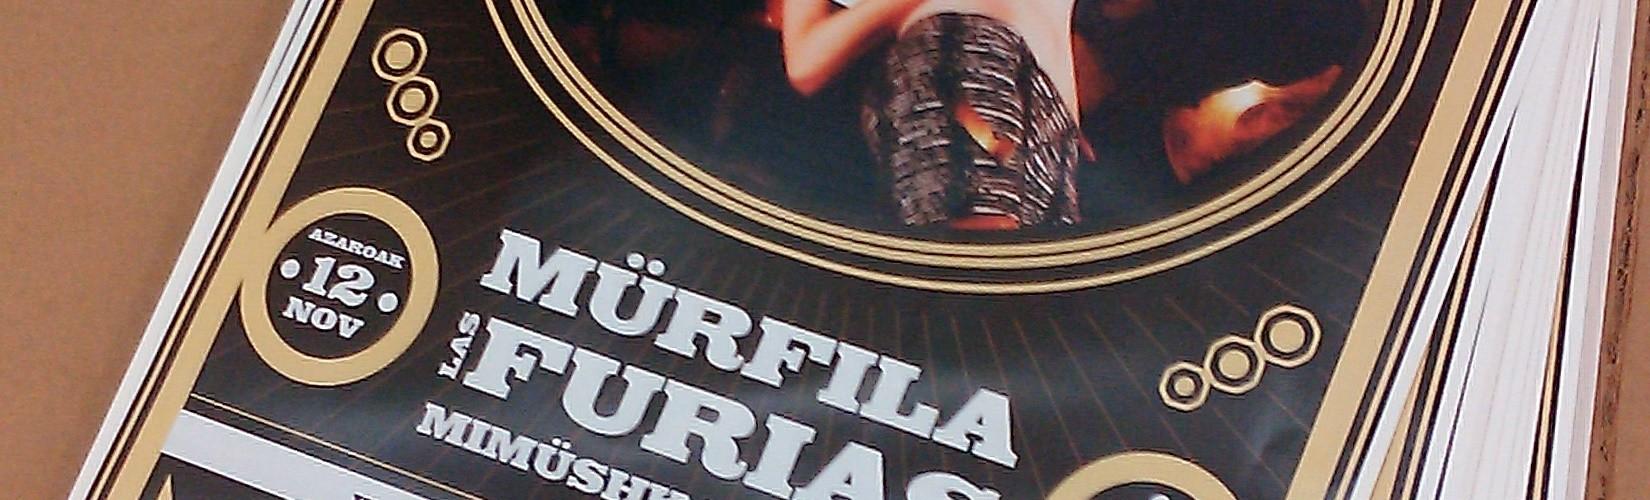 Murfila